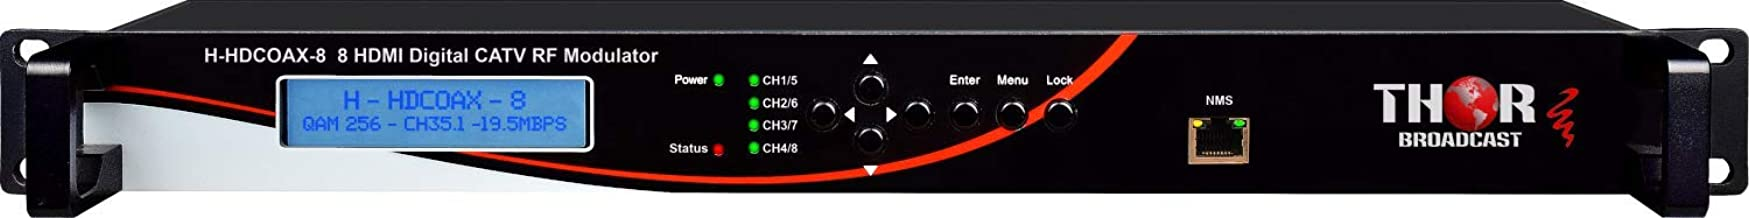 8 HDMI Profesional Digital CATV RF Modulator -QAM ATSC ISDB-T - HDCP Free